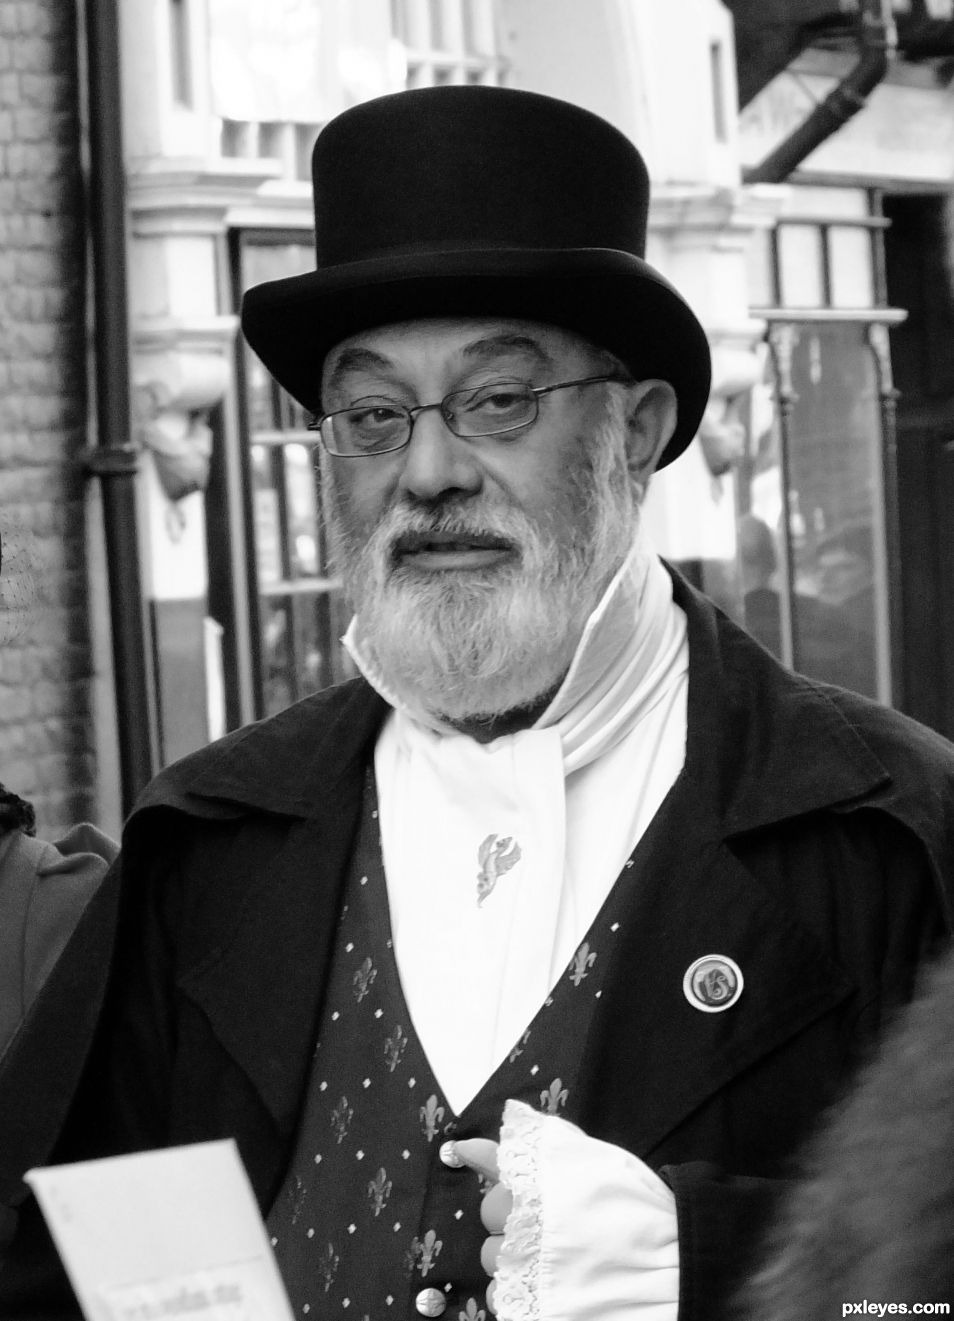 The Fear of Beards-POGONOPHOBIA